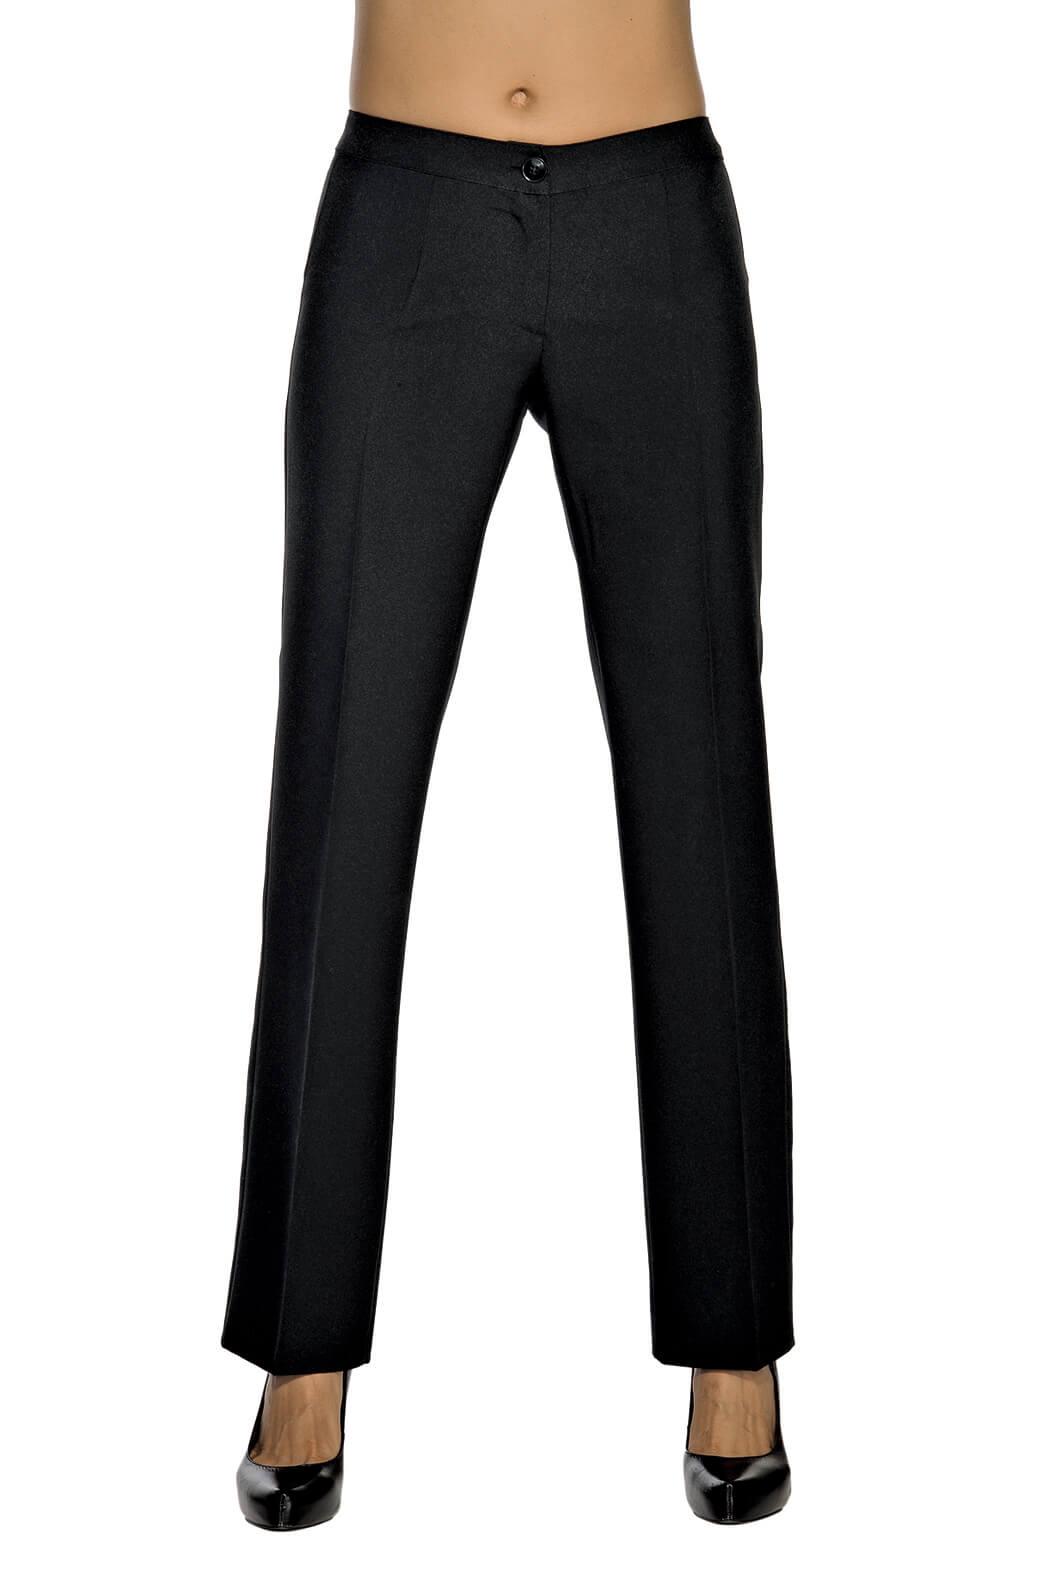 Pantalon-Stretch-Femme-Noir